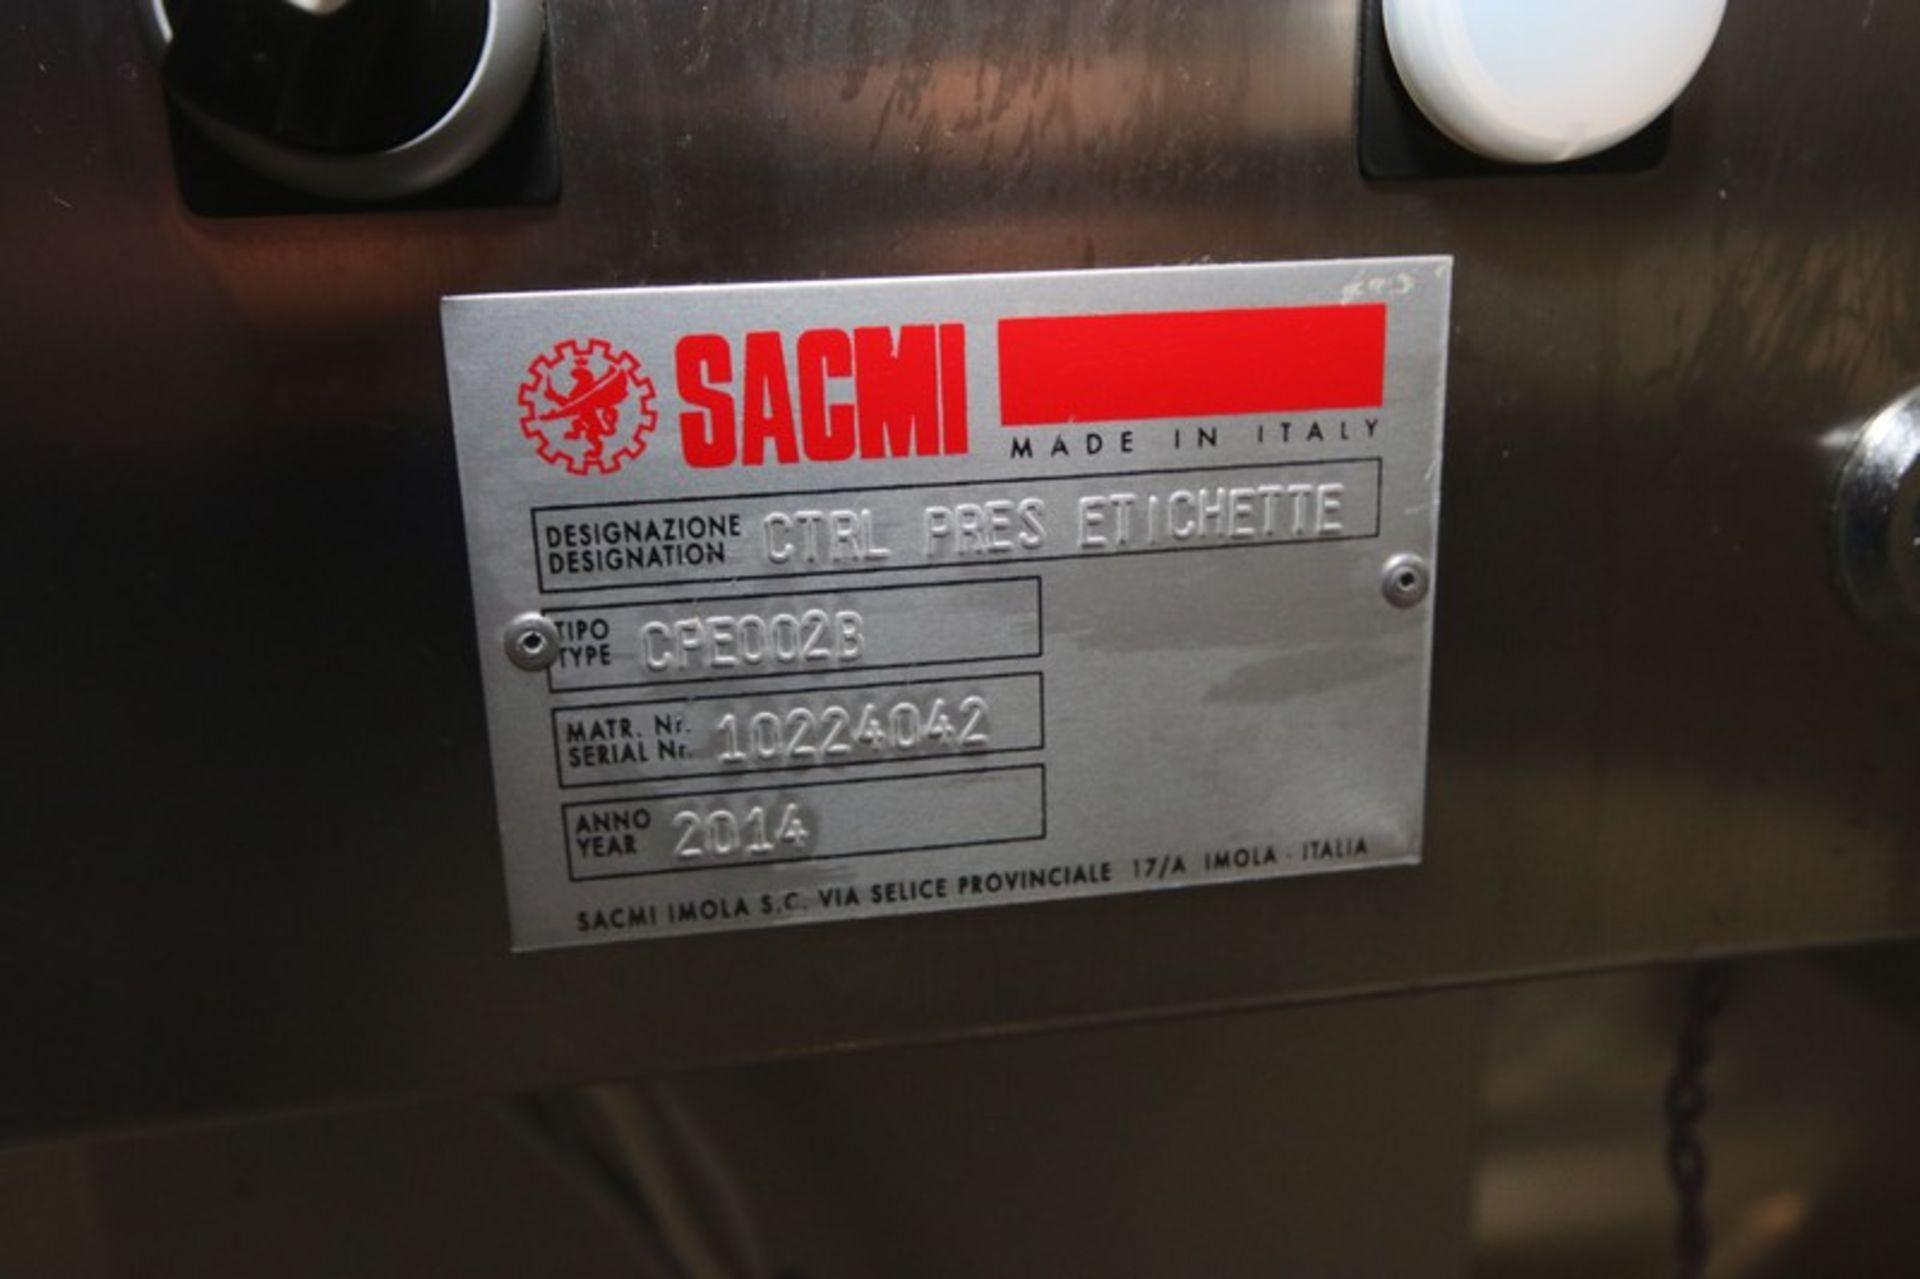 "Lot 11 - 2014 Sacmi Vision Inspection System, M/N LVS 360, Type: CPE002B, S/N 10224042, Aprox. 10"" W x 16"""